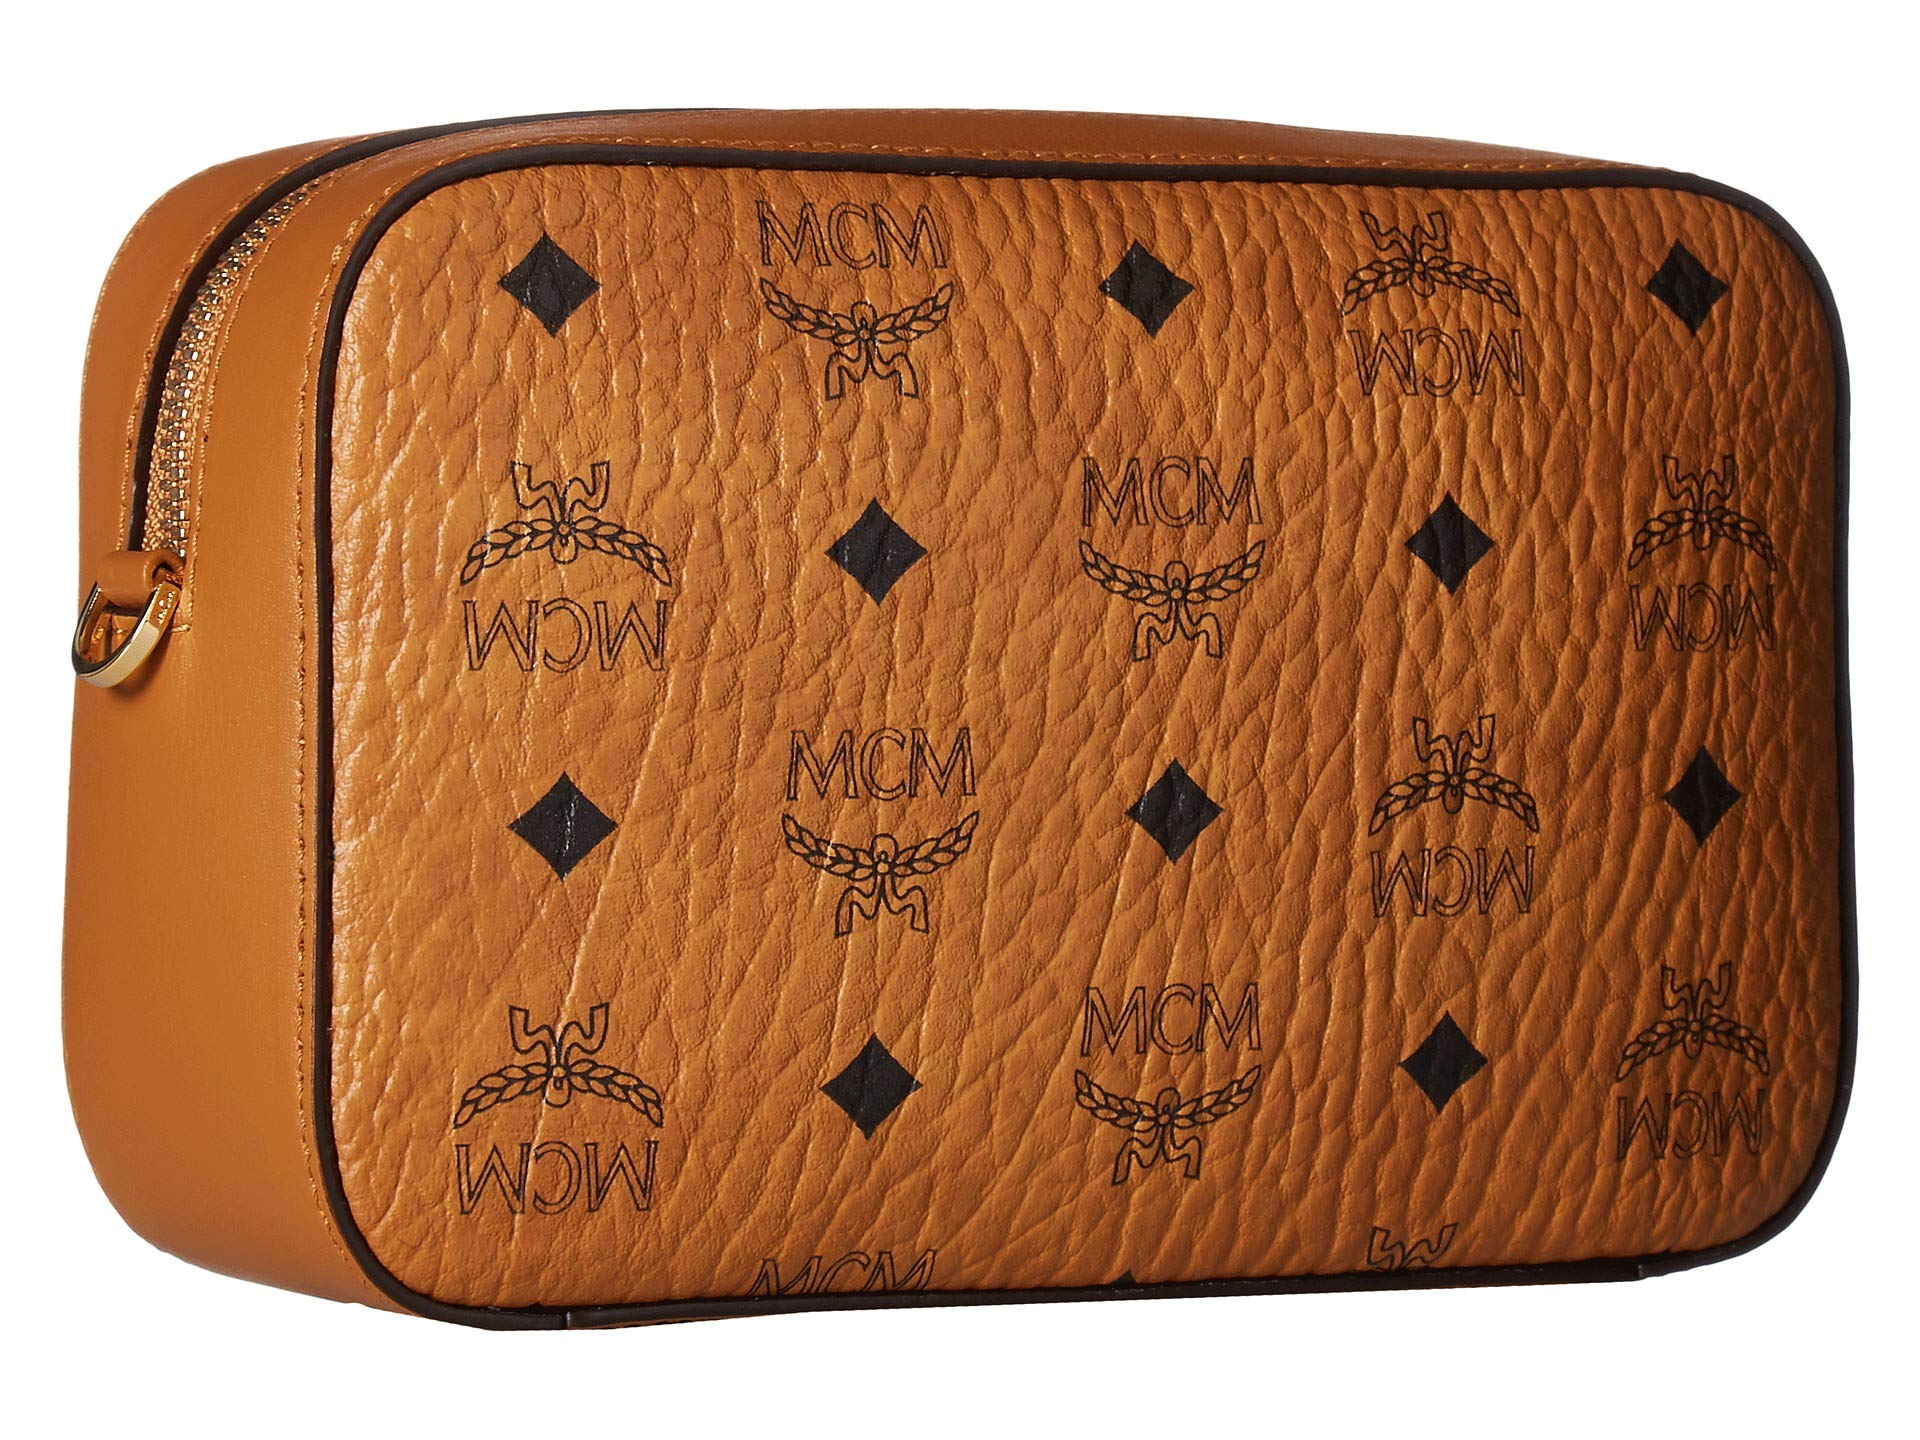 Others Visetos Mcm Cognac Small Original Leather Goods qXSrSpwd